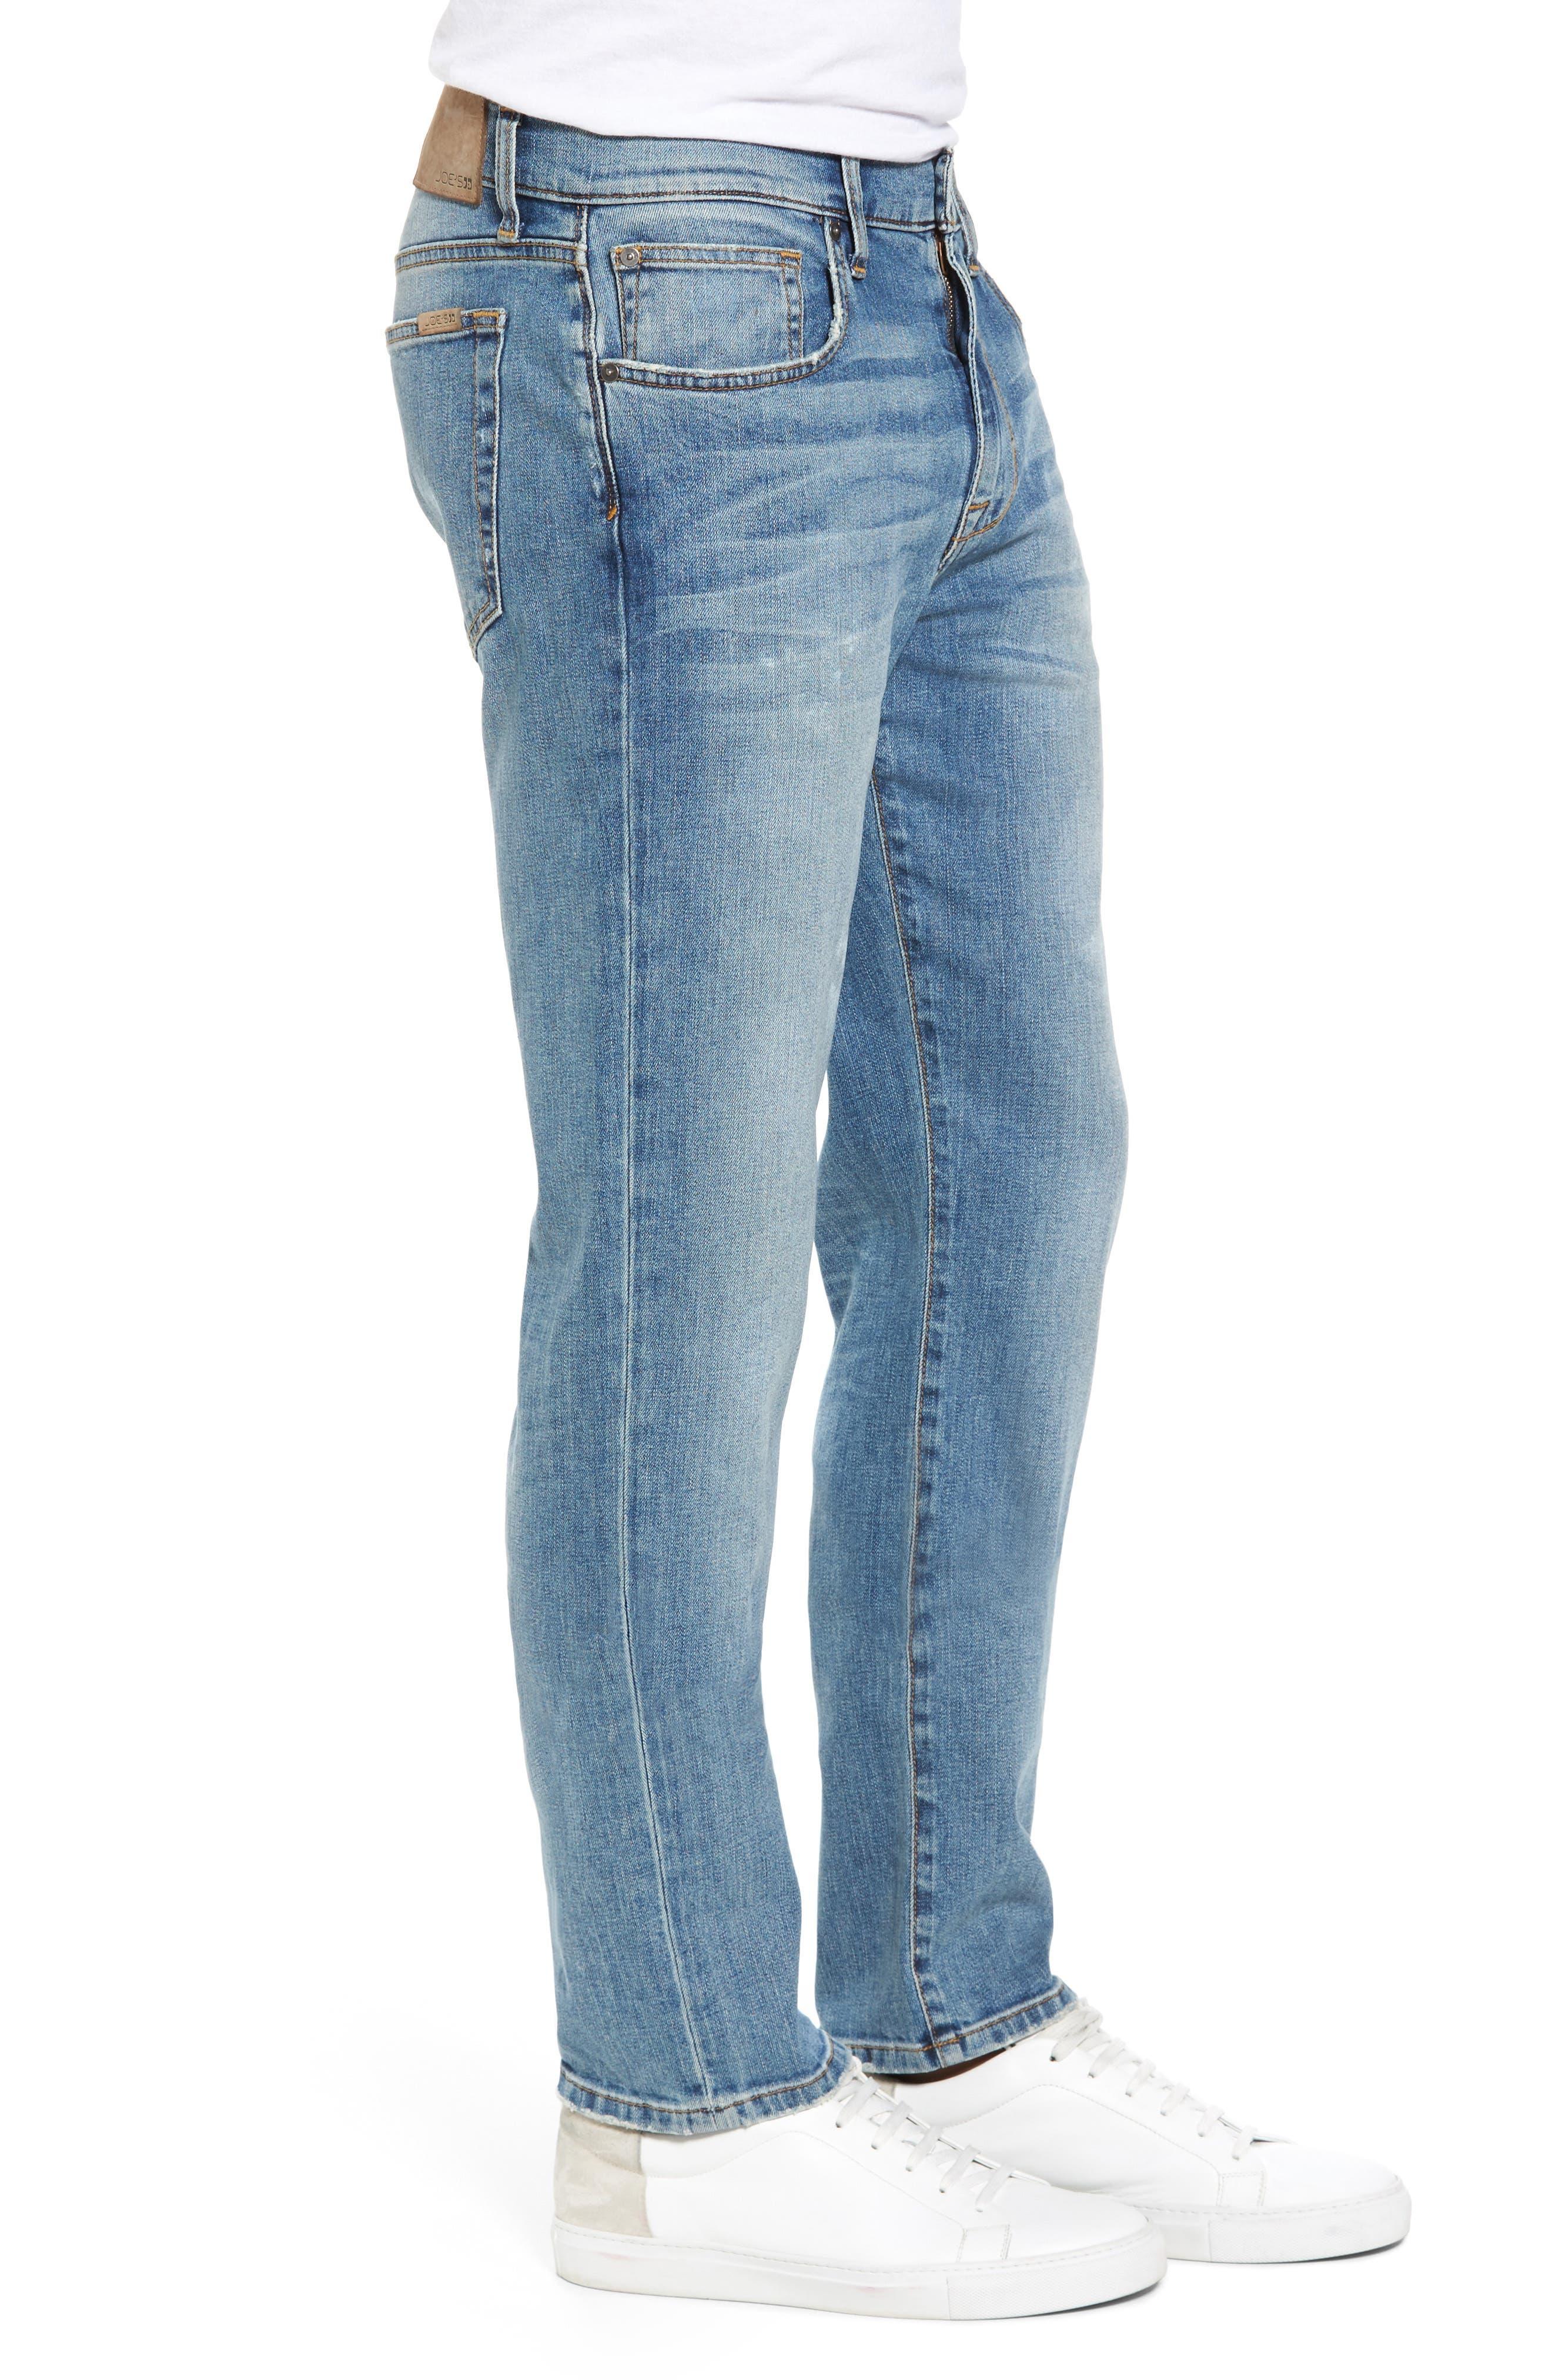 Brixton Slim Straight Fit Jeans,                             Alternate thumbnail 3, color,                             475